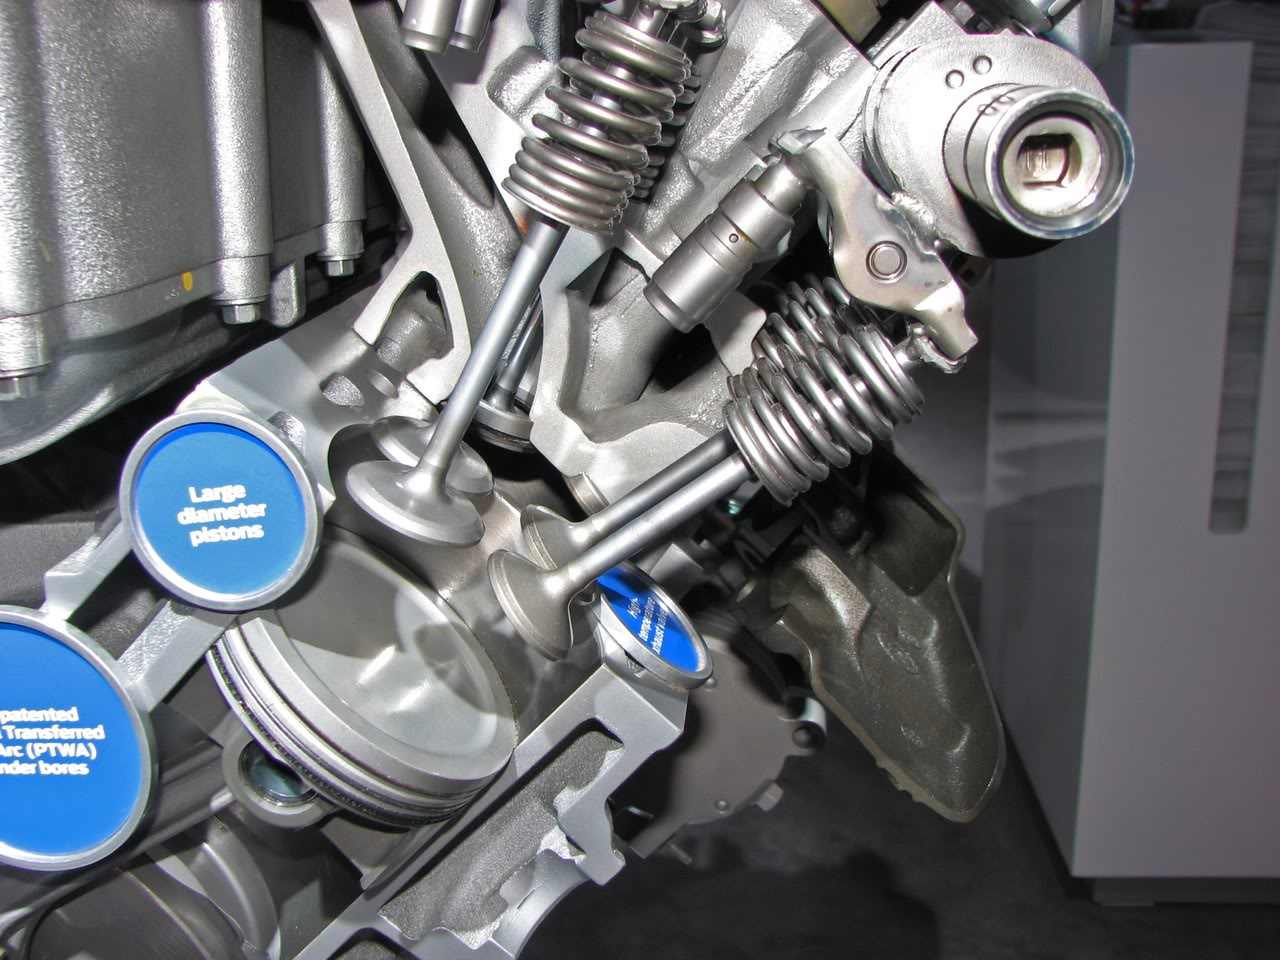 GT500cylindervalvesetc.jpg